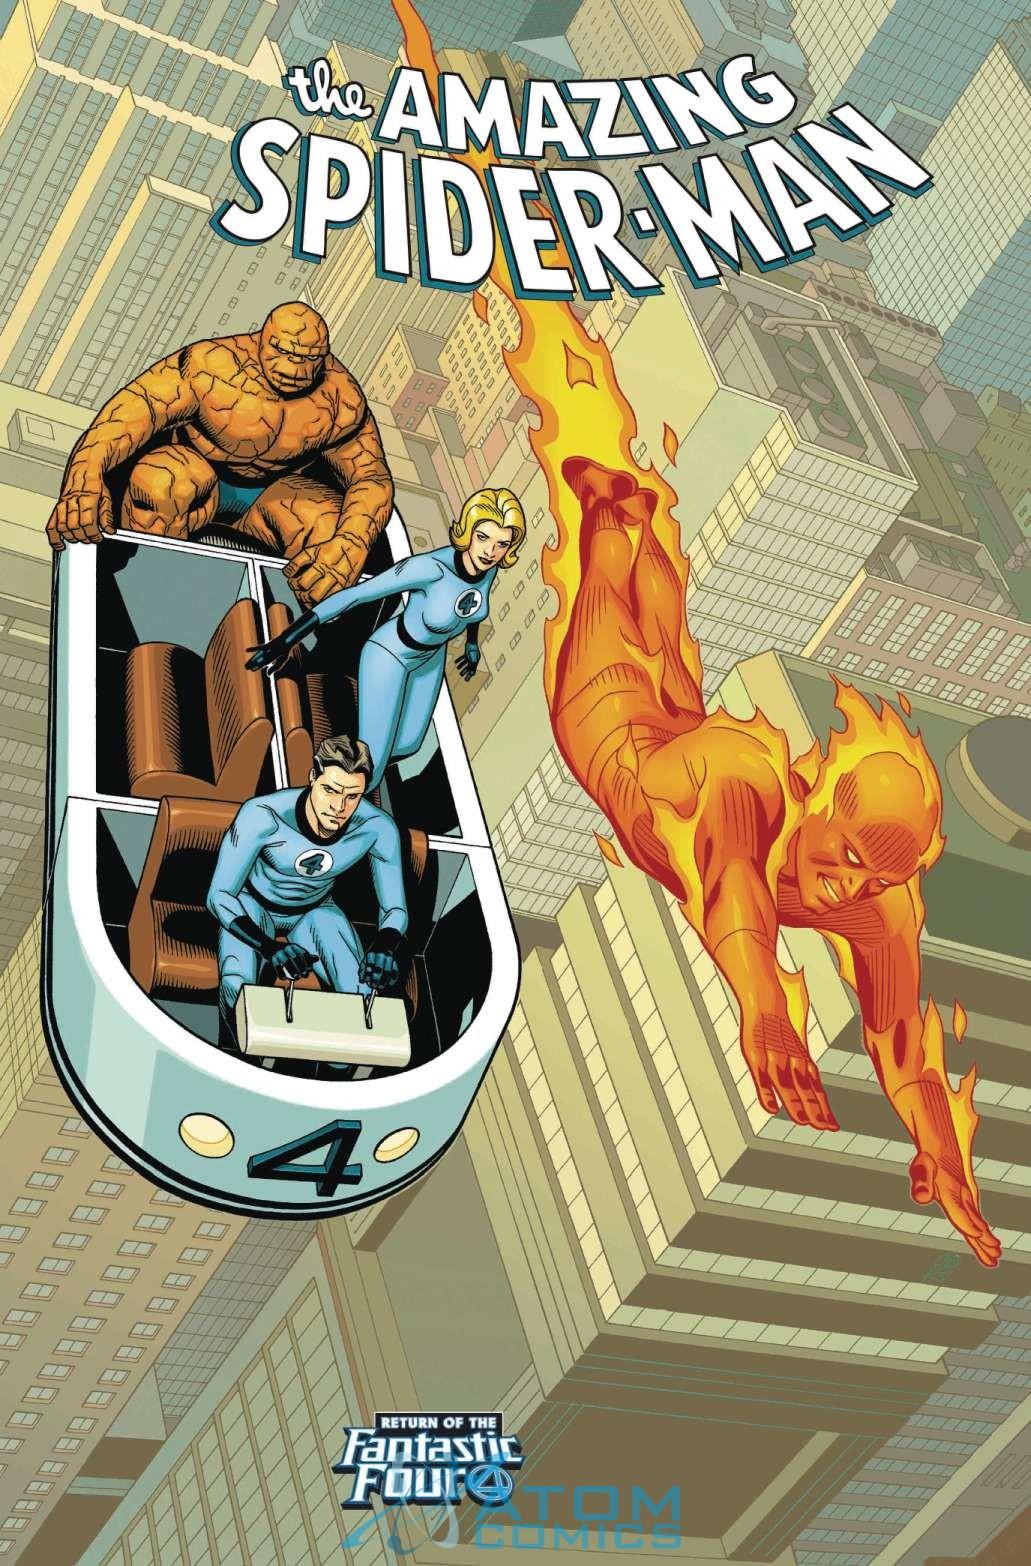 Amazing Spider-Man Vol 5 4 Return of the Fantastic Four Variant.jpg